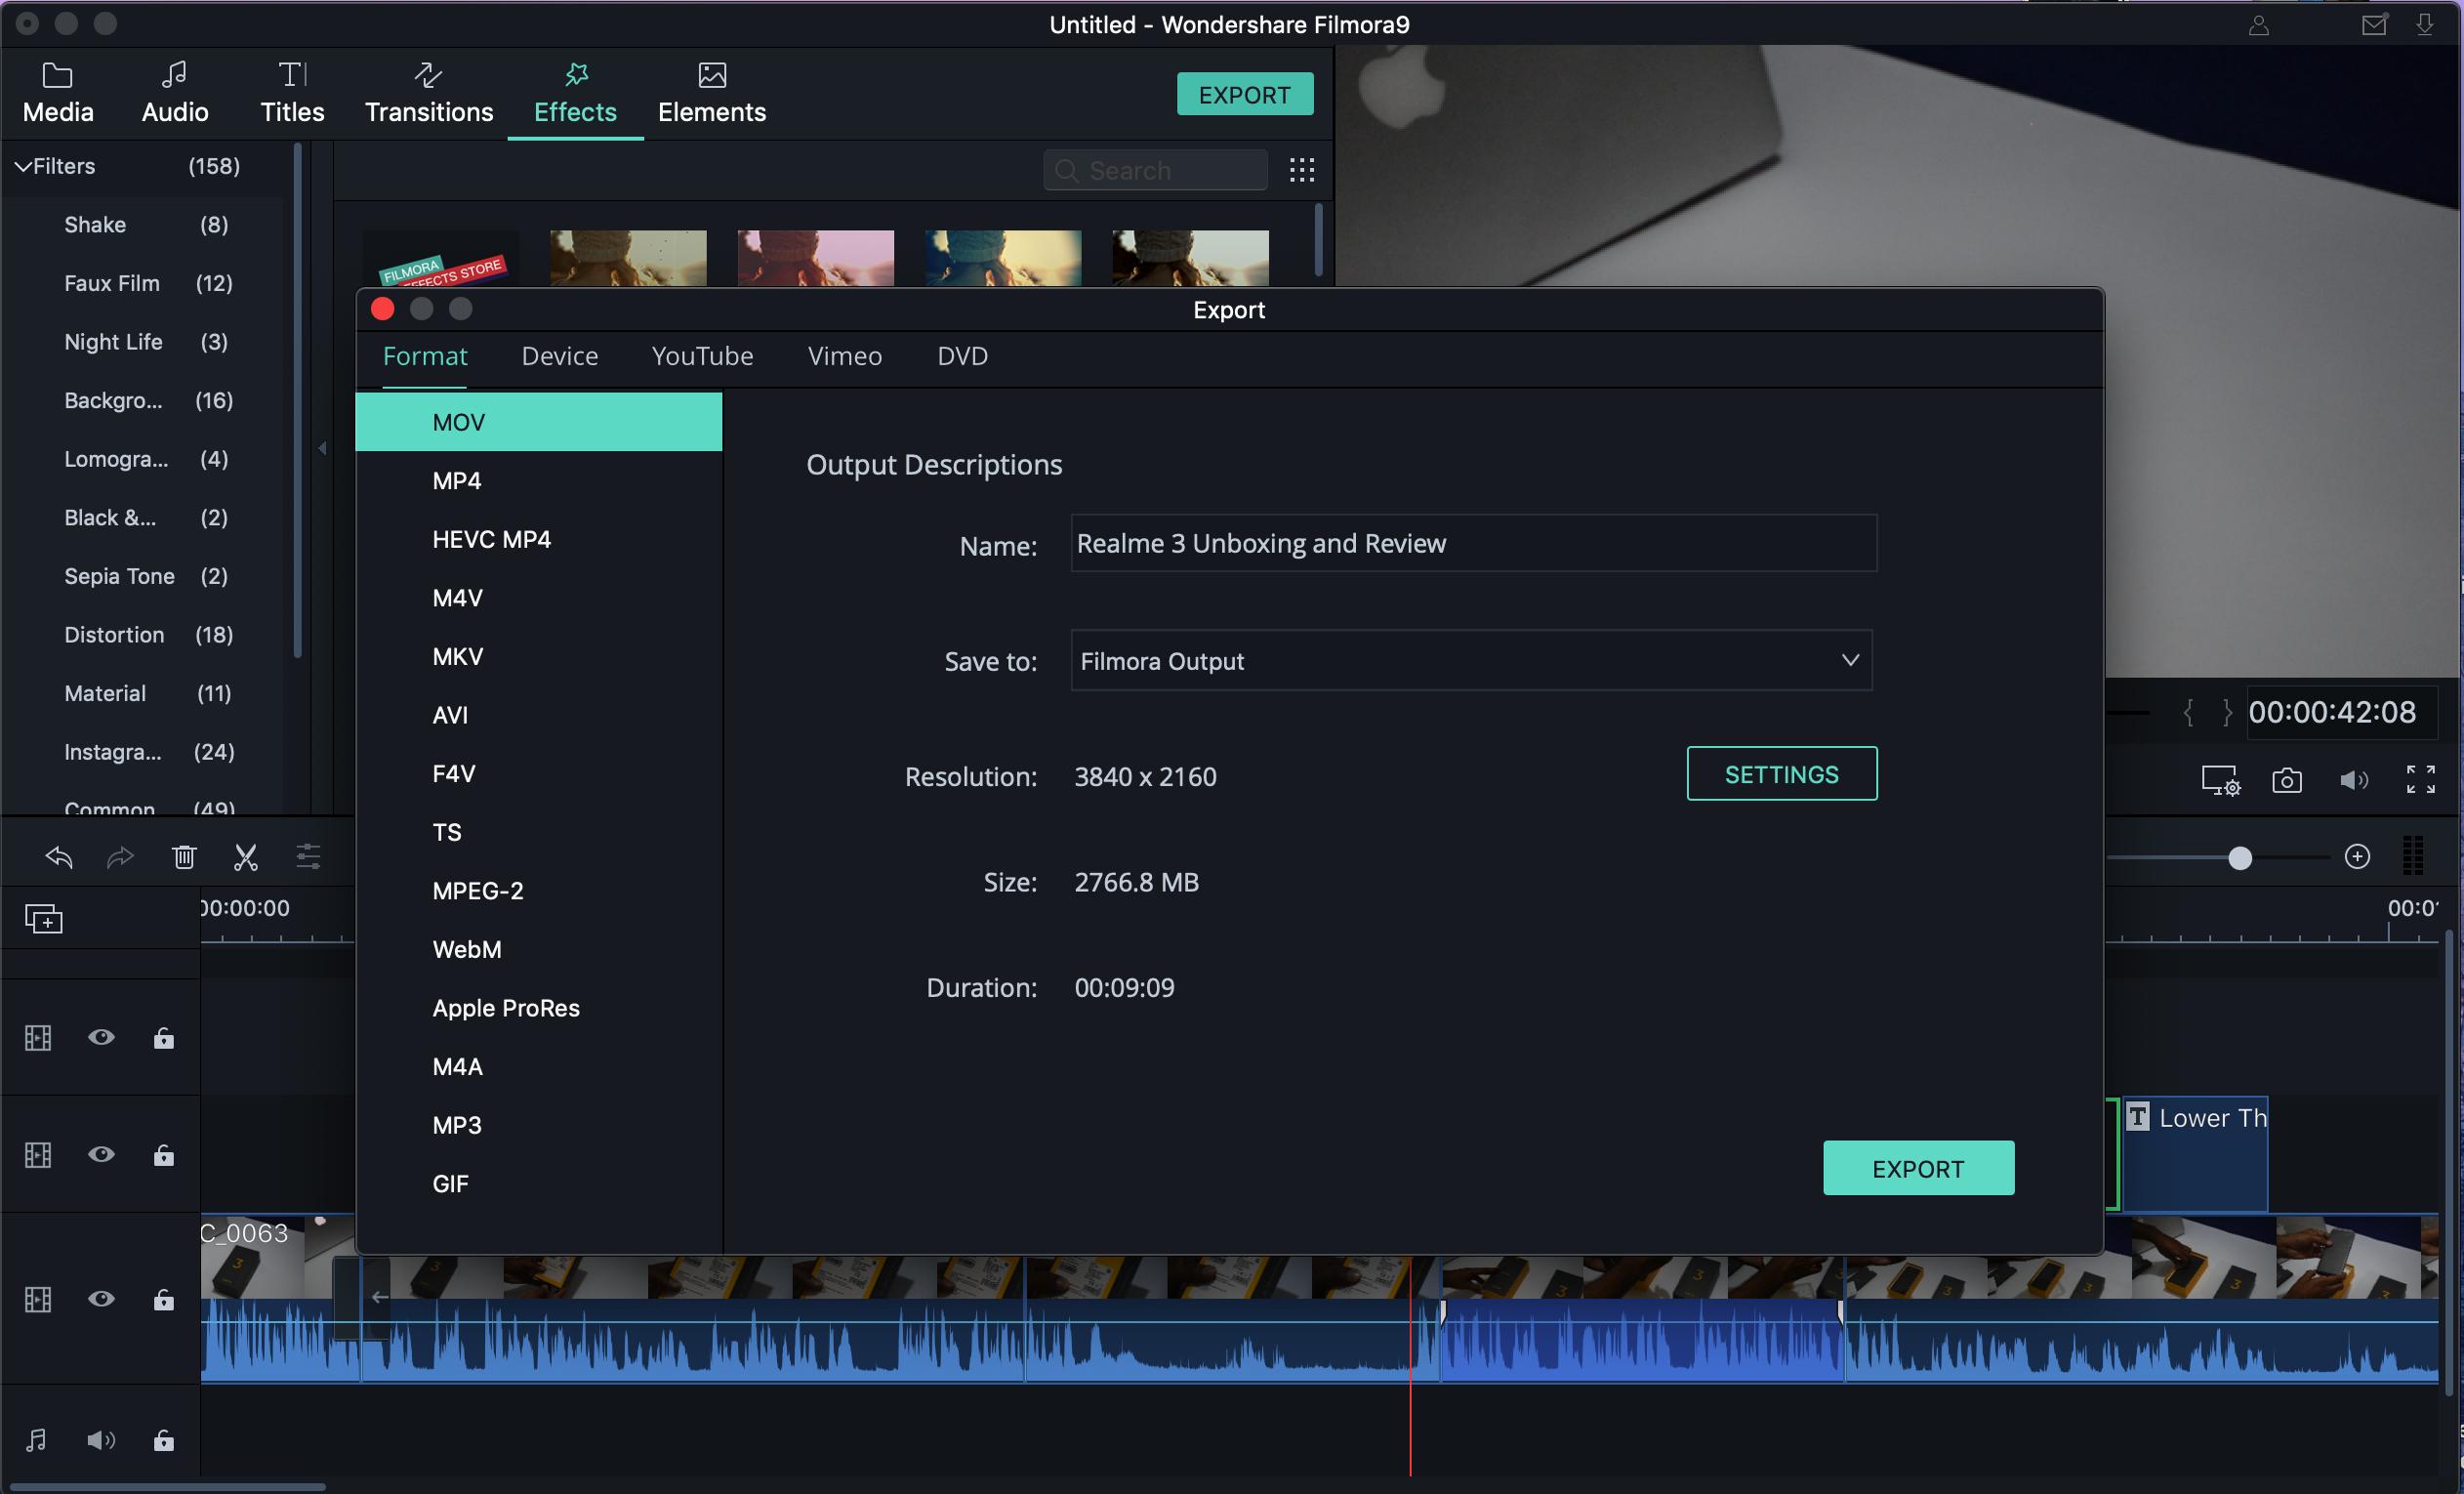 Wondershare Filmora Build 7.8 9